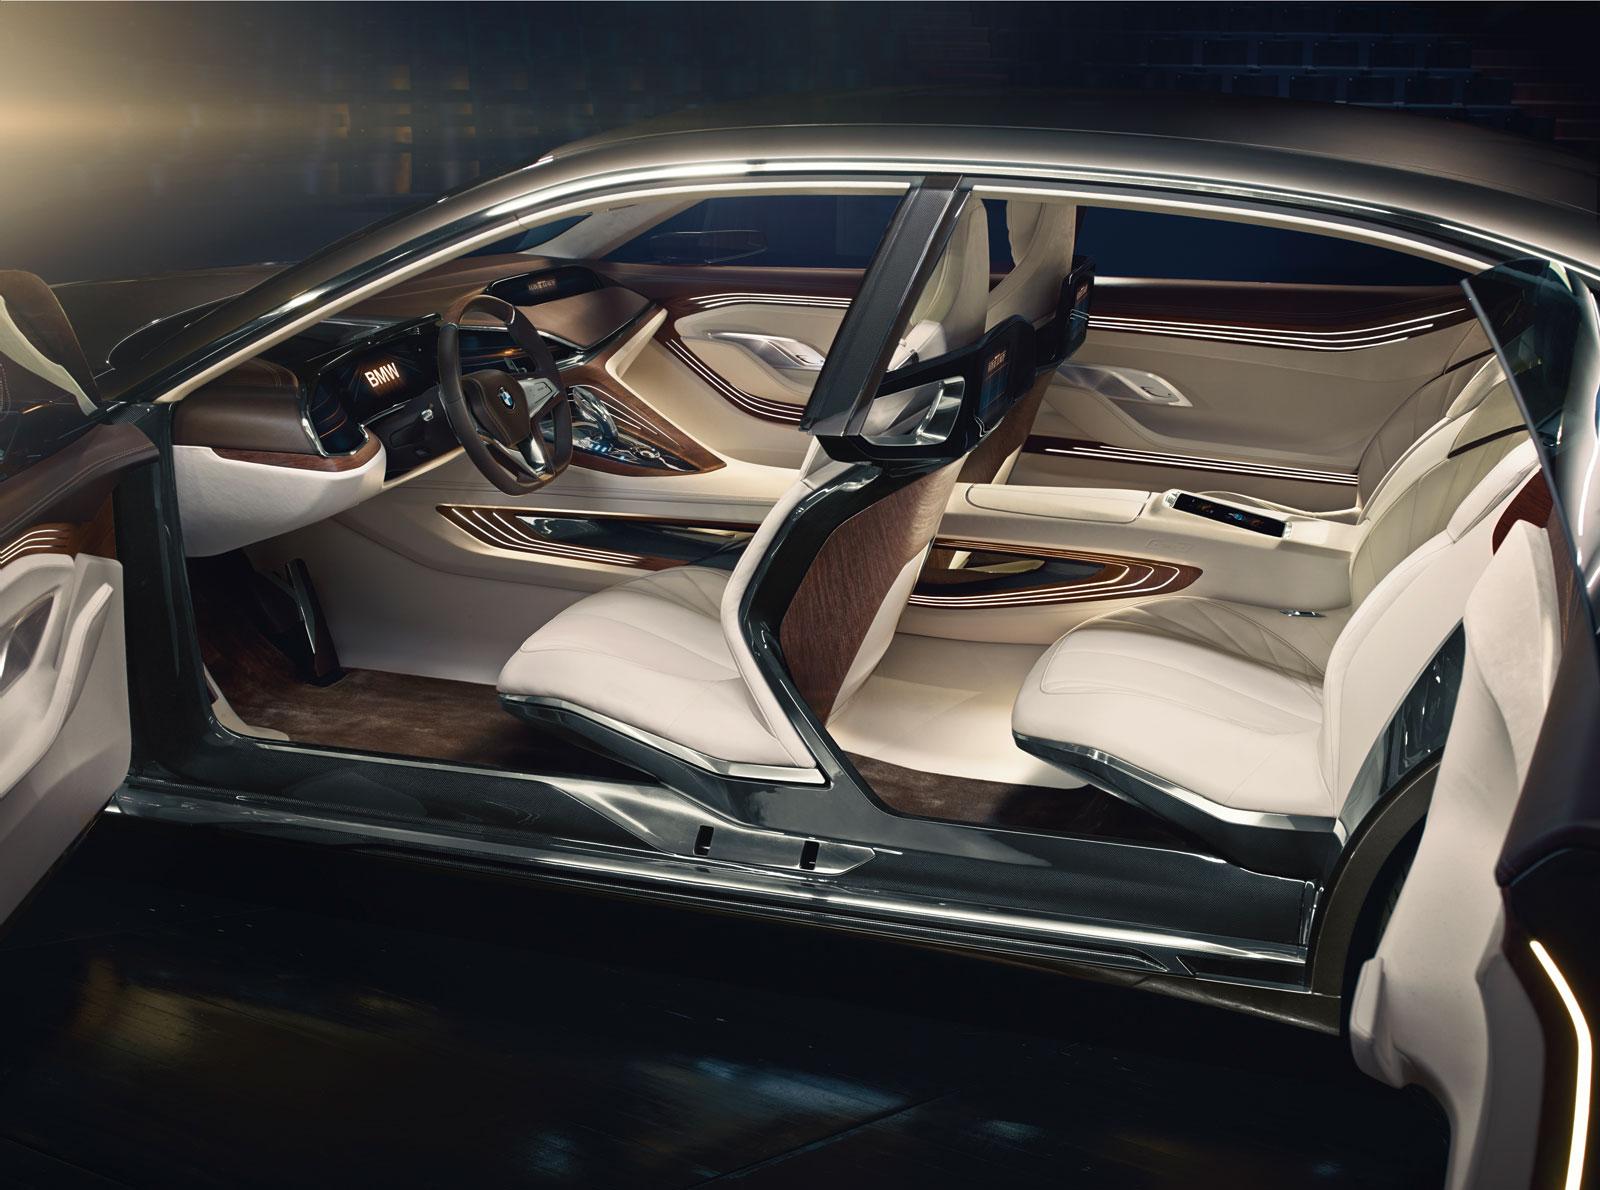 Mini Cooper BMW >> BMW Vision Future Luxury Concept Interior - Car Body Design